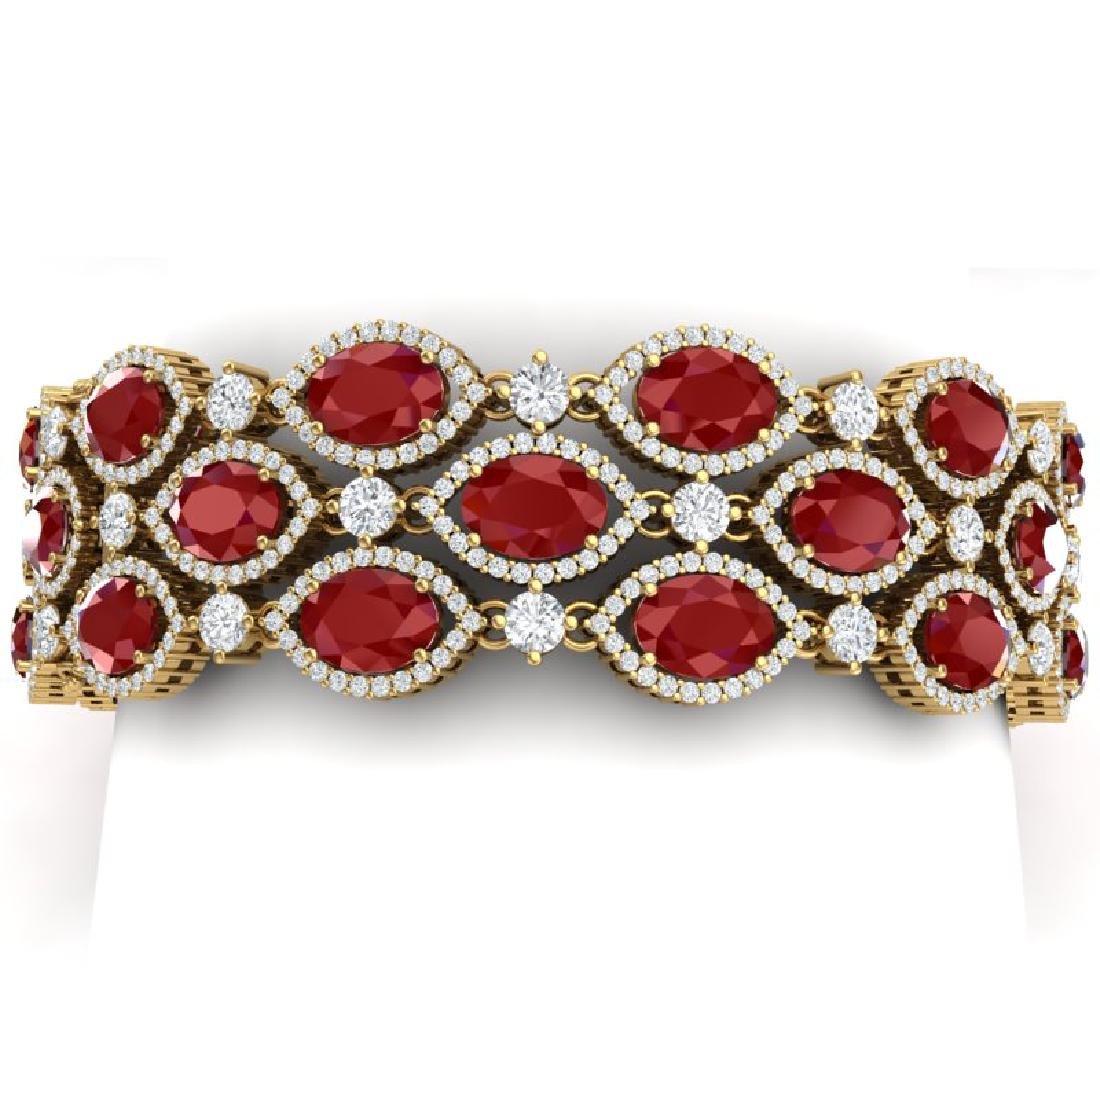 47.84 CTW Royalty Ruby & VS Diamond Bracelet 18K Yellow